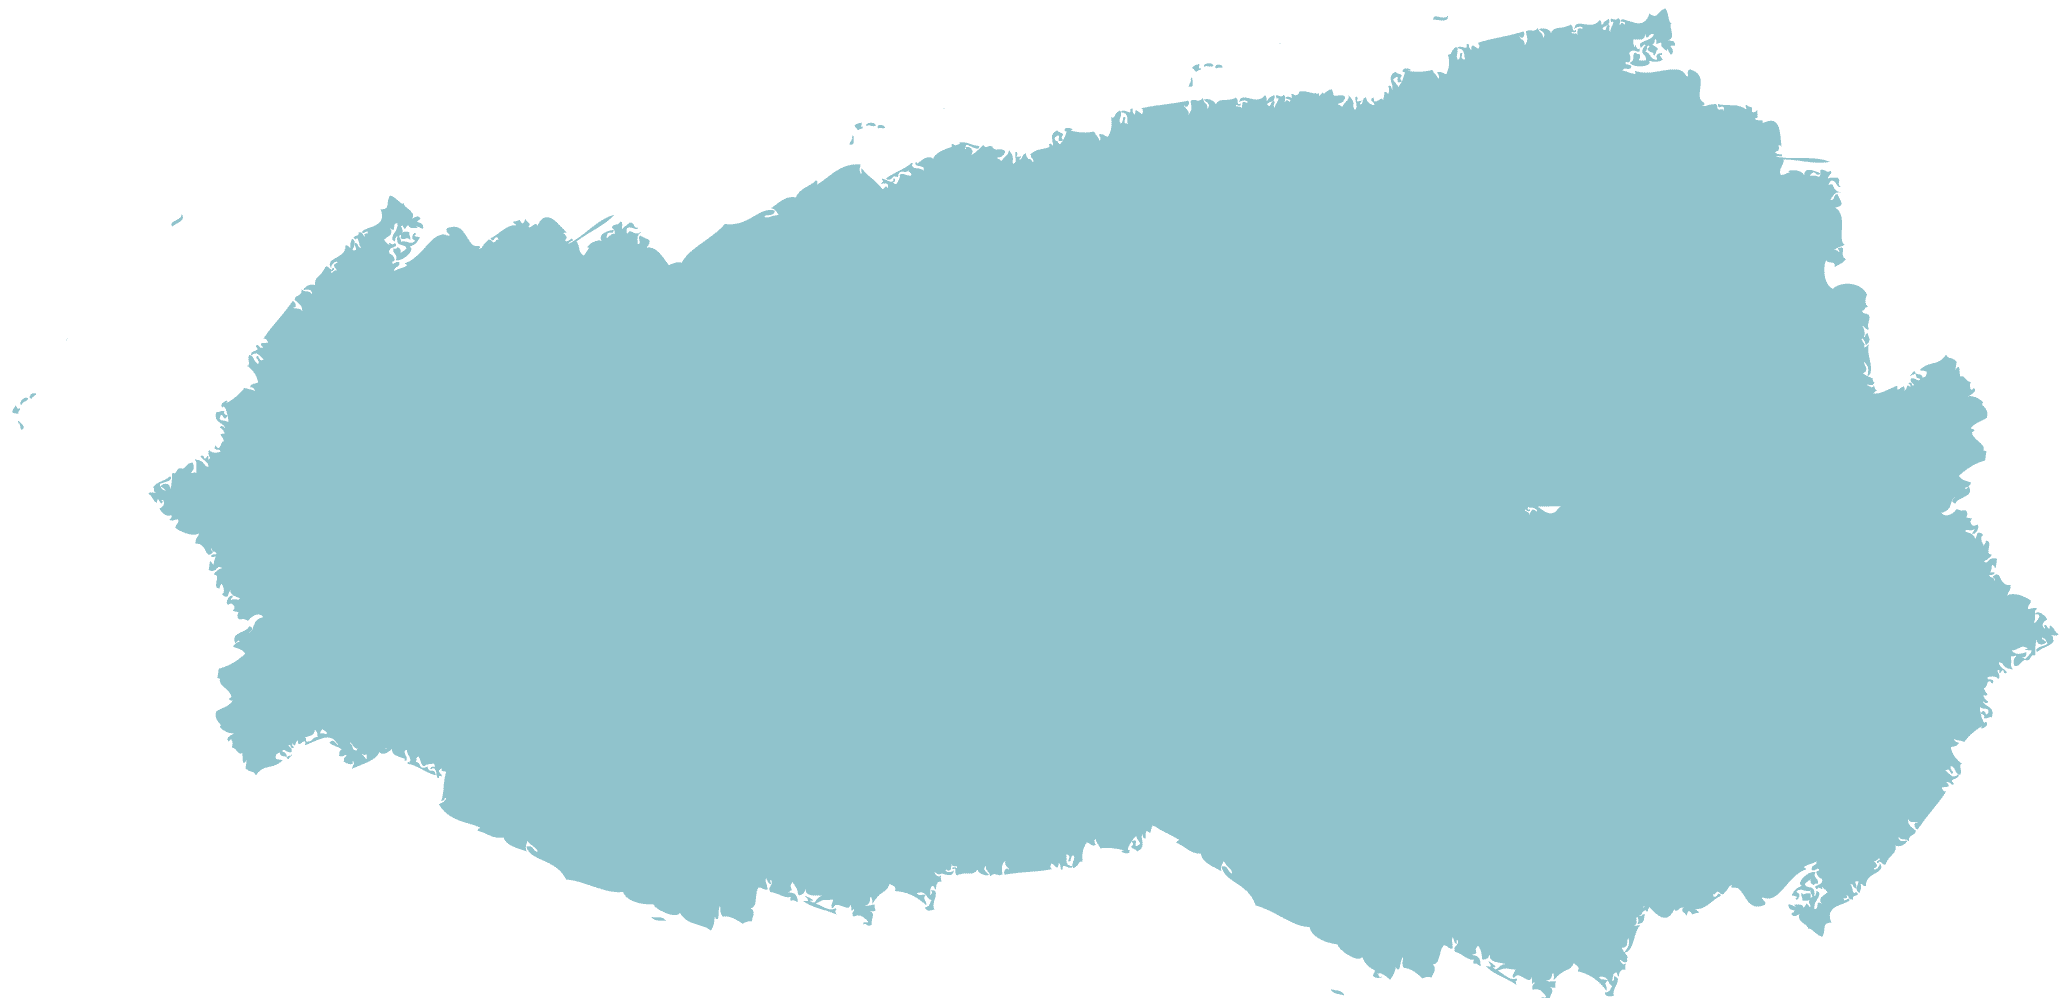 2021-03-17 (2)